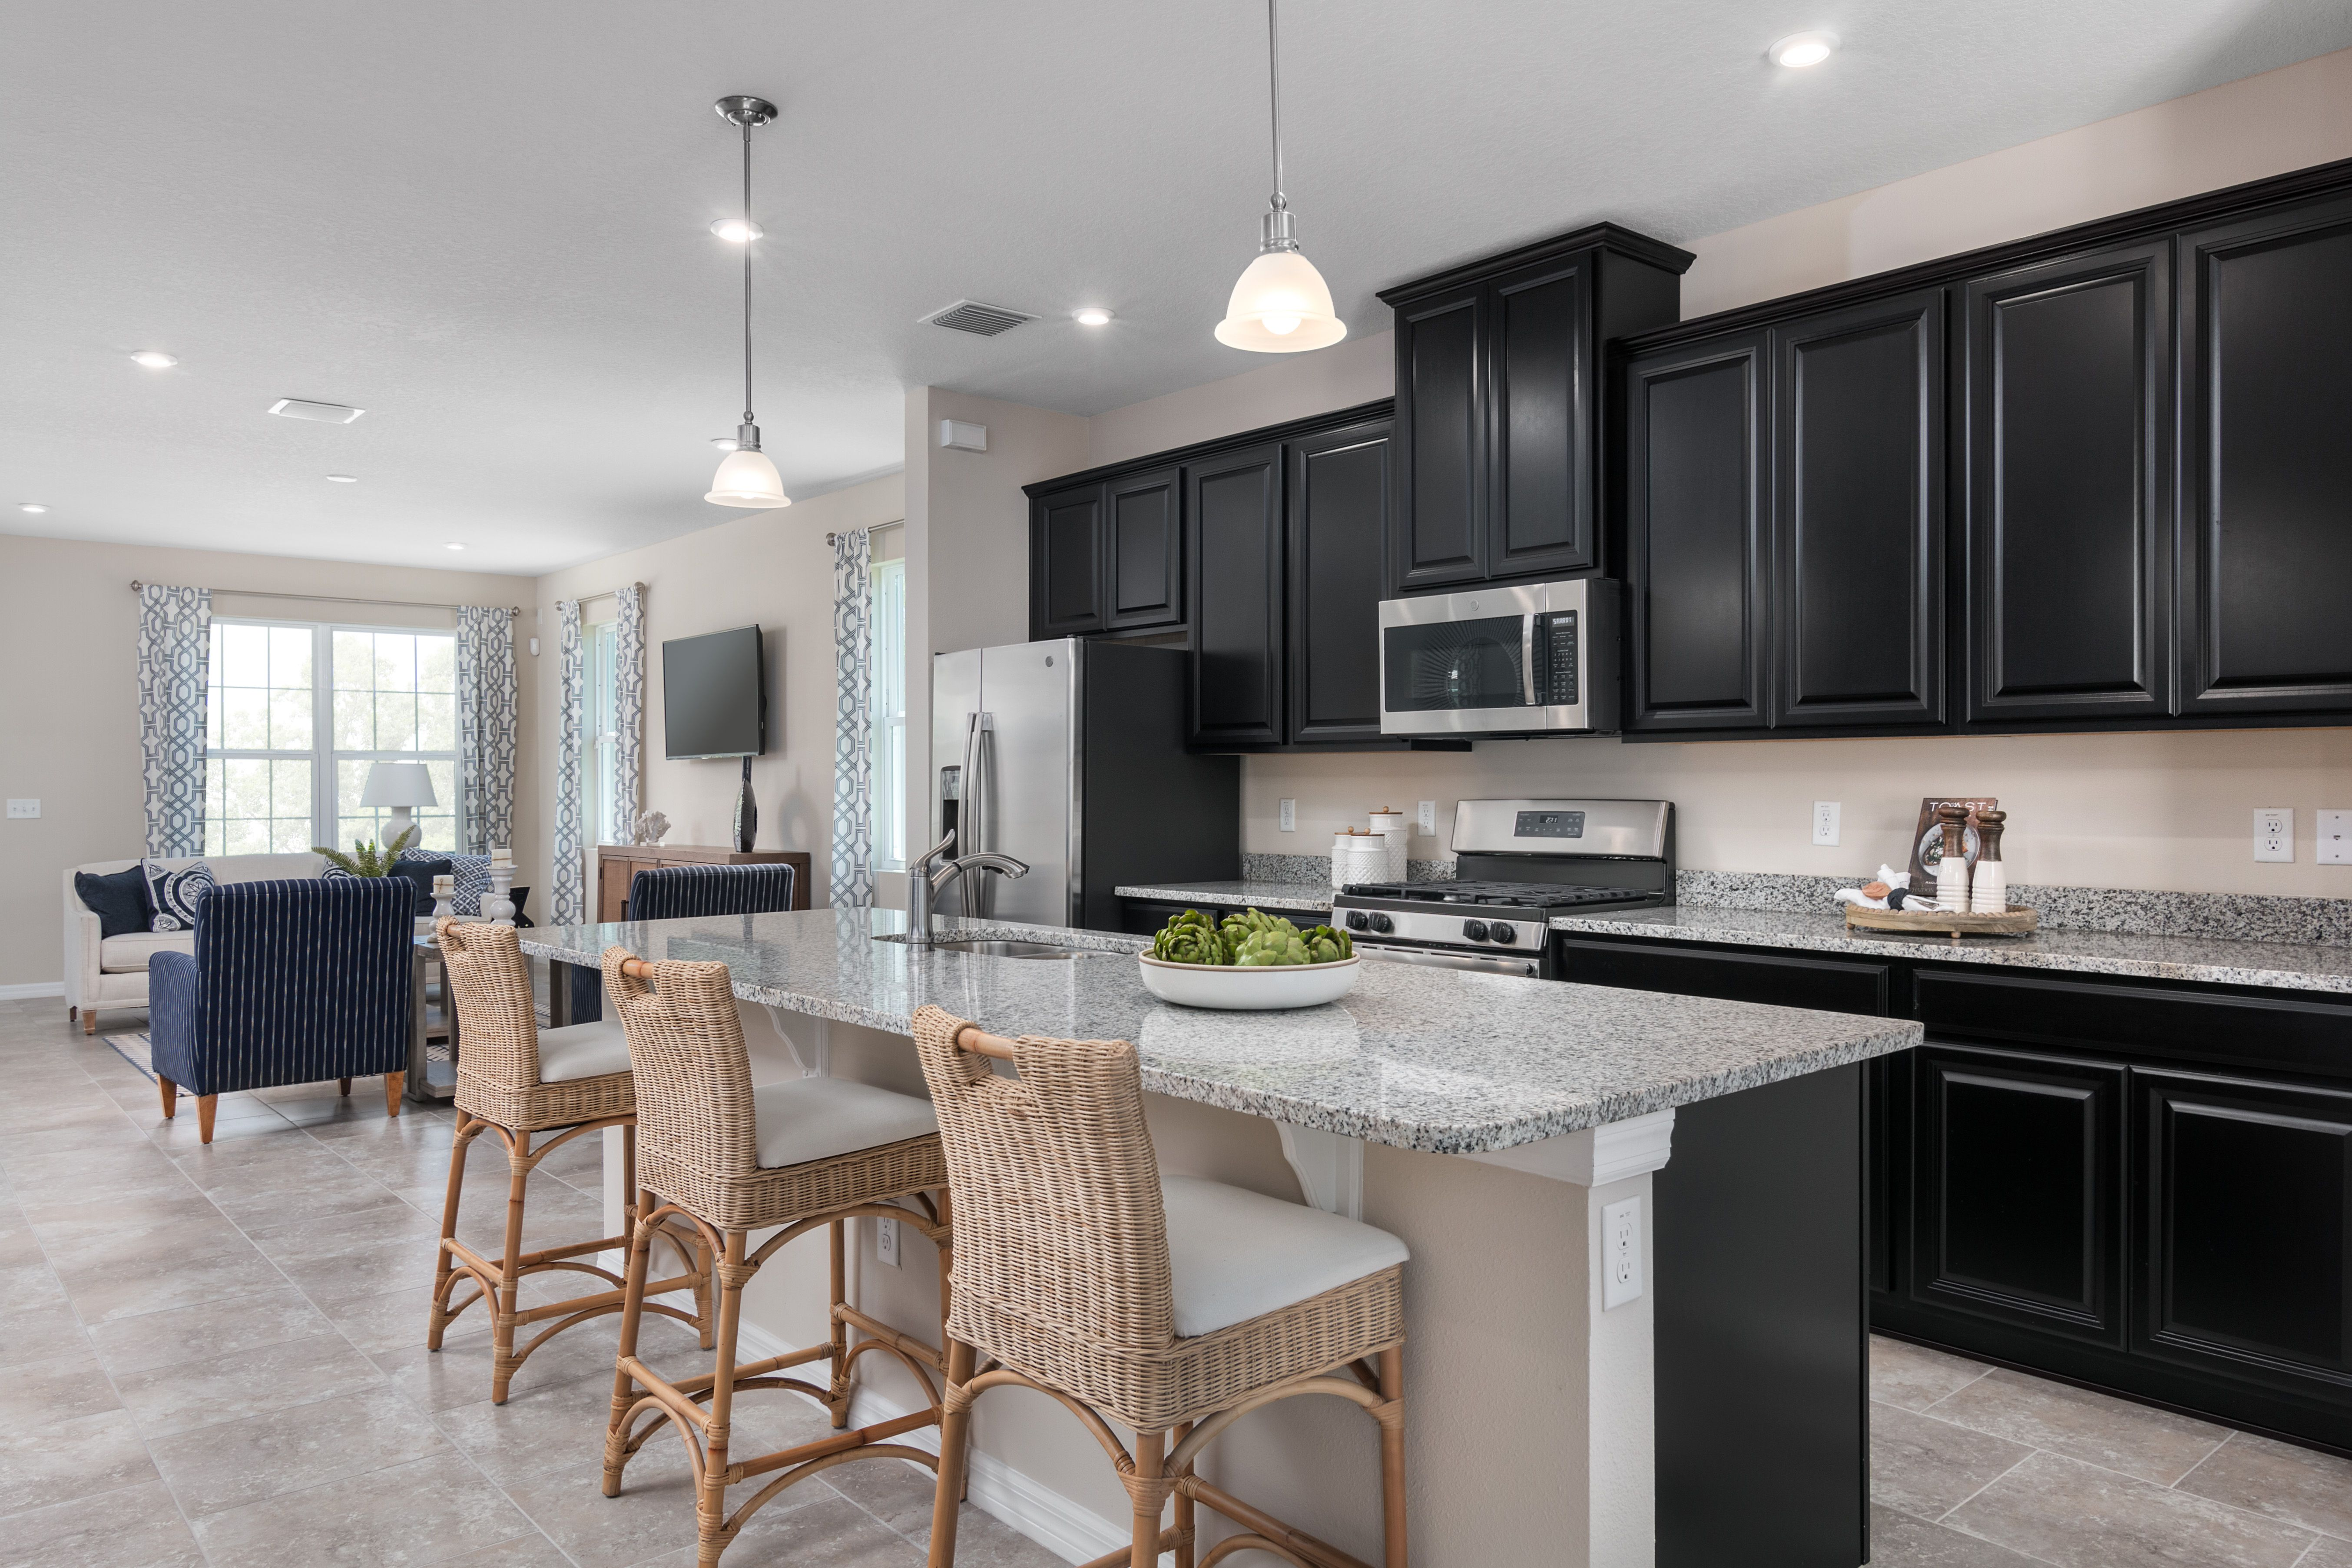 Kitchen featured in the Haydn By Ryan Homes in Orlando, FL